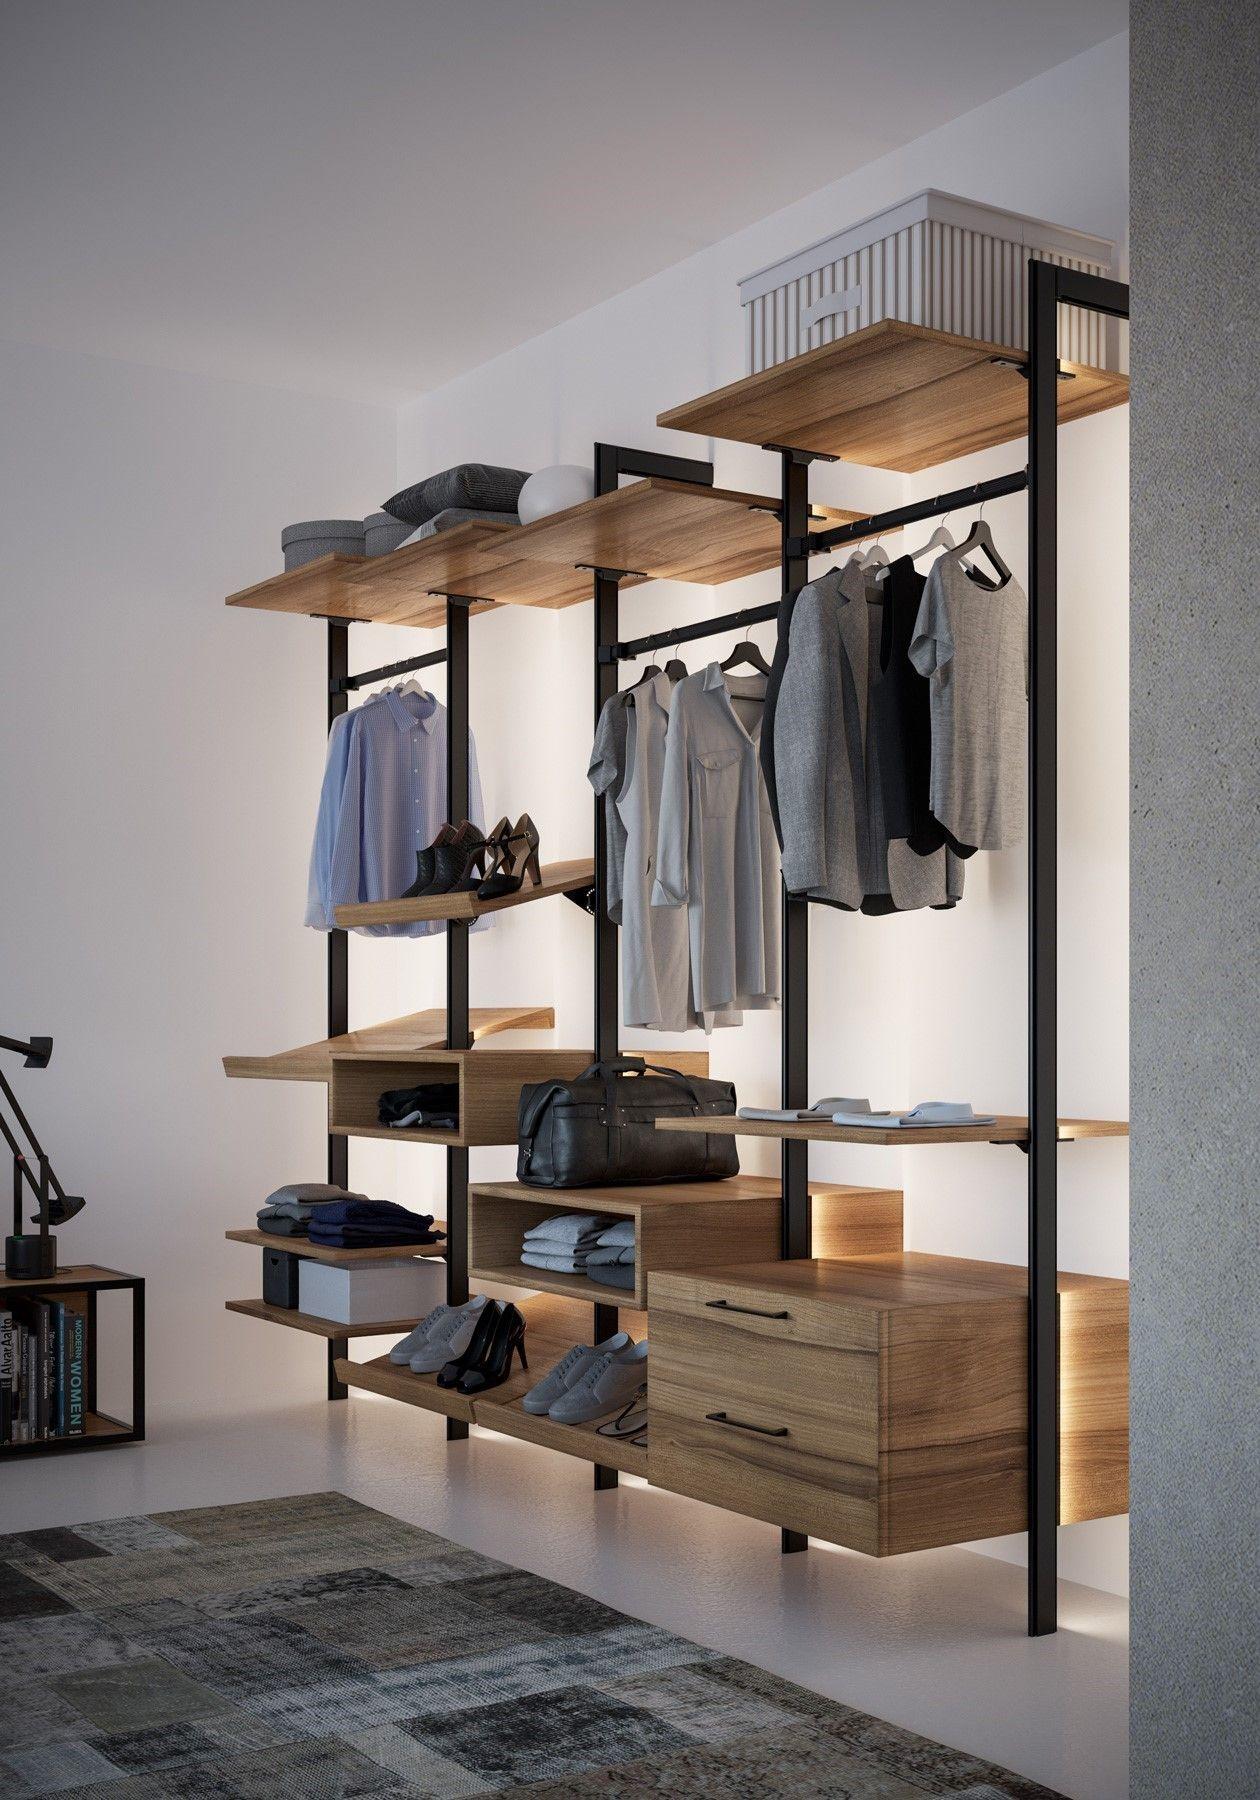 Garde Robe In 2020 Minimalist Living Room Furniture Home Room Design Wardrobe Room #wardrobe #in #the #living #room